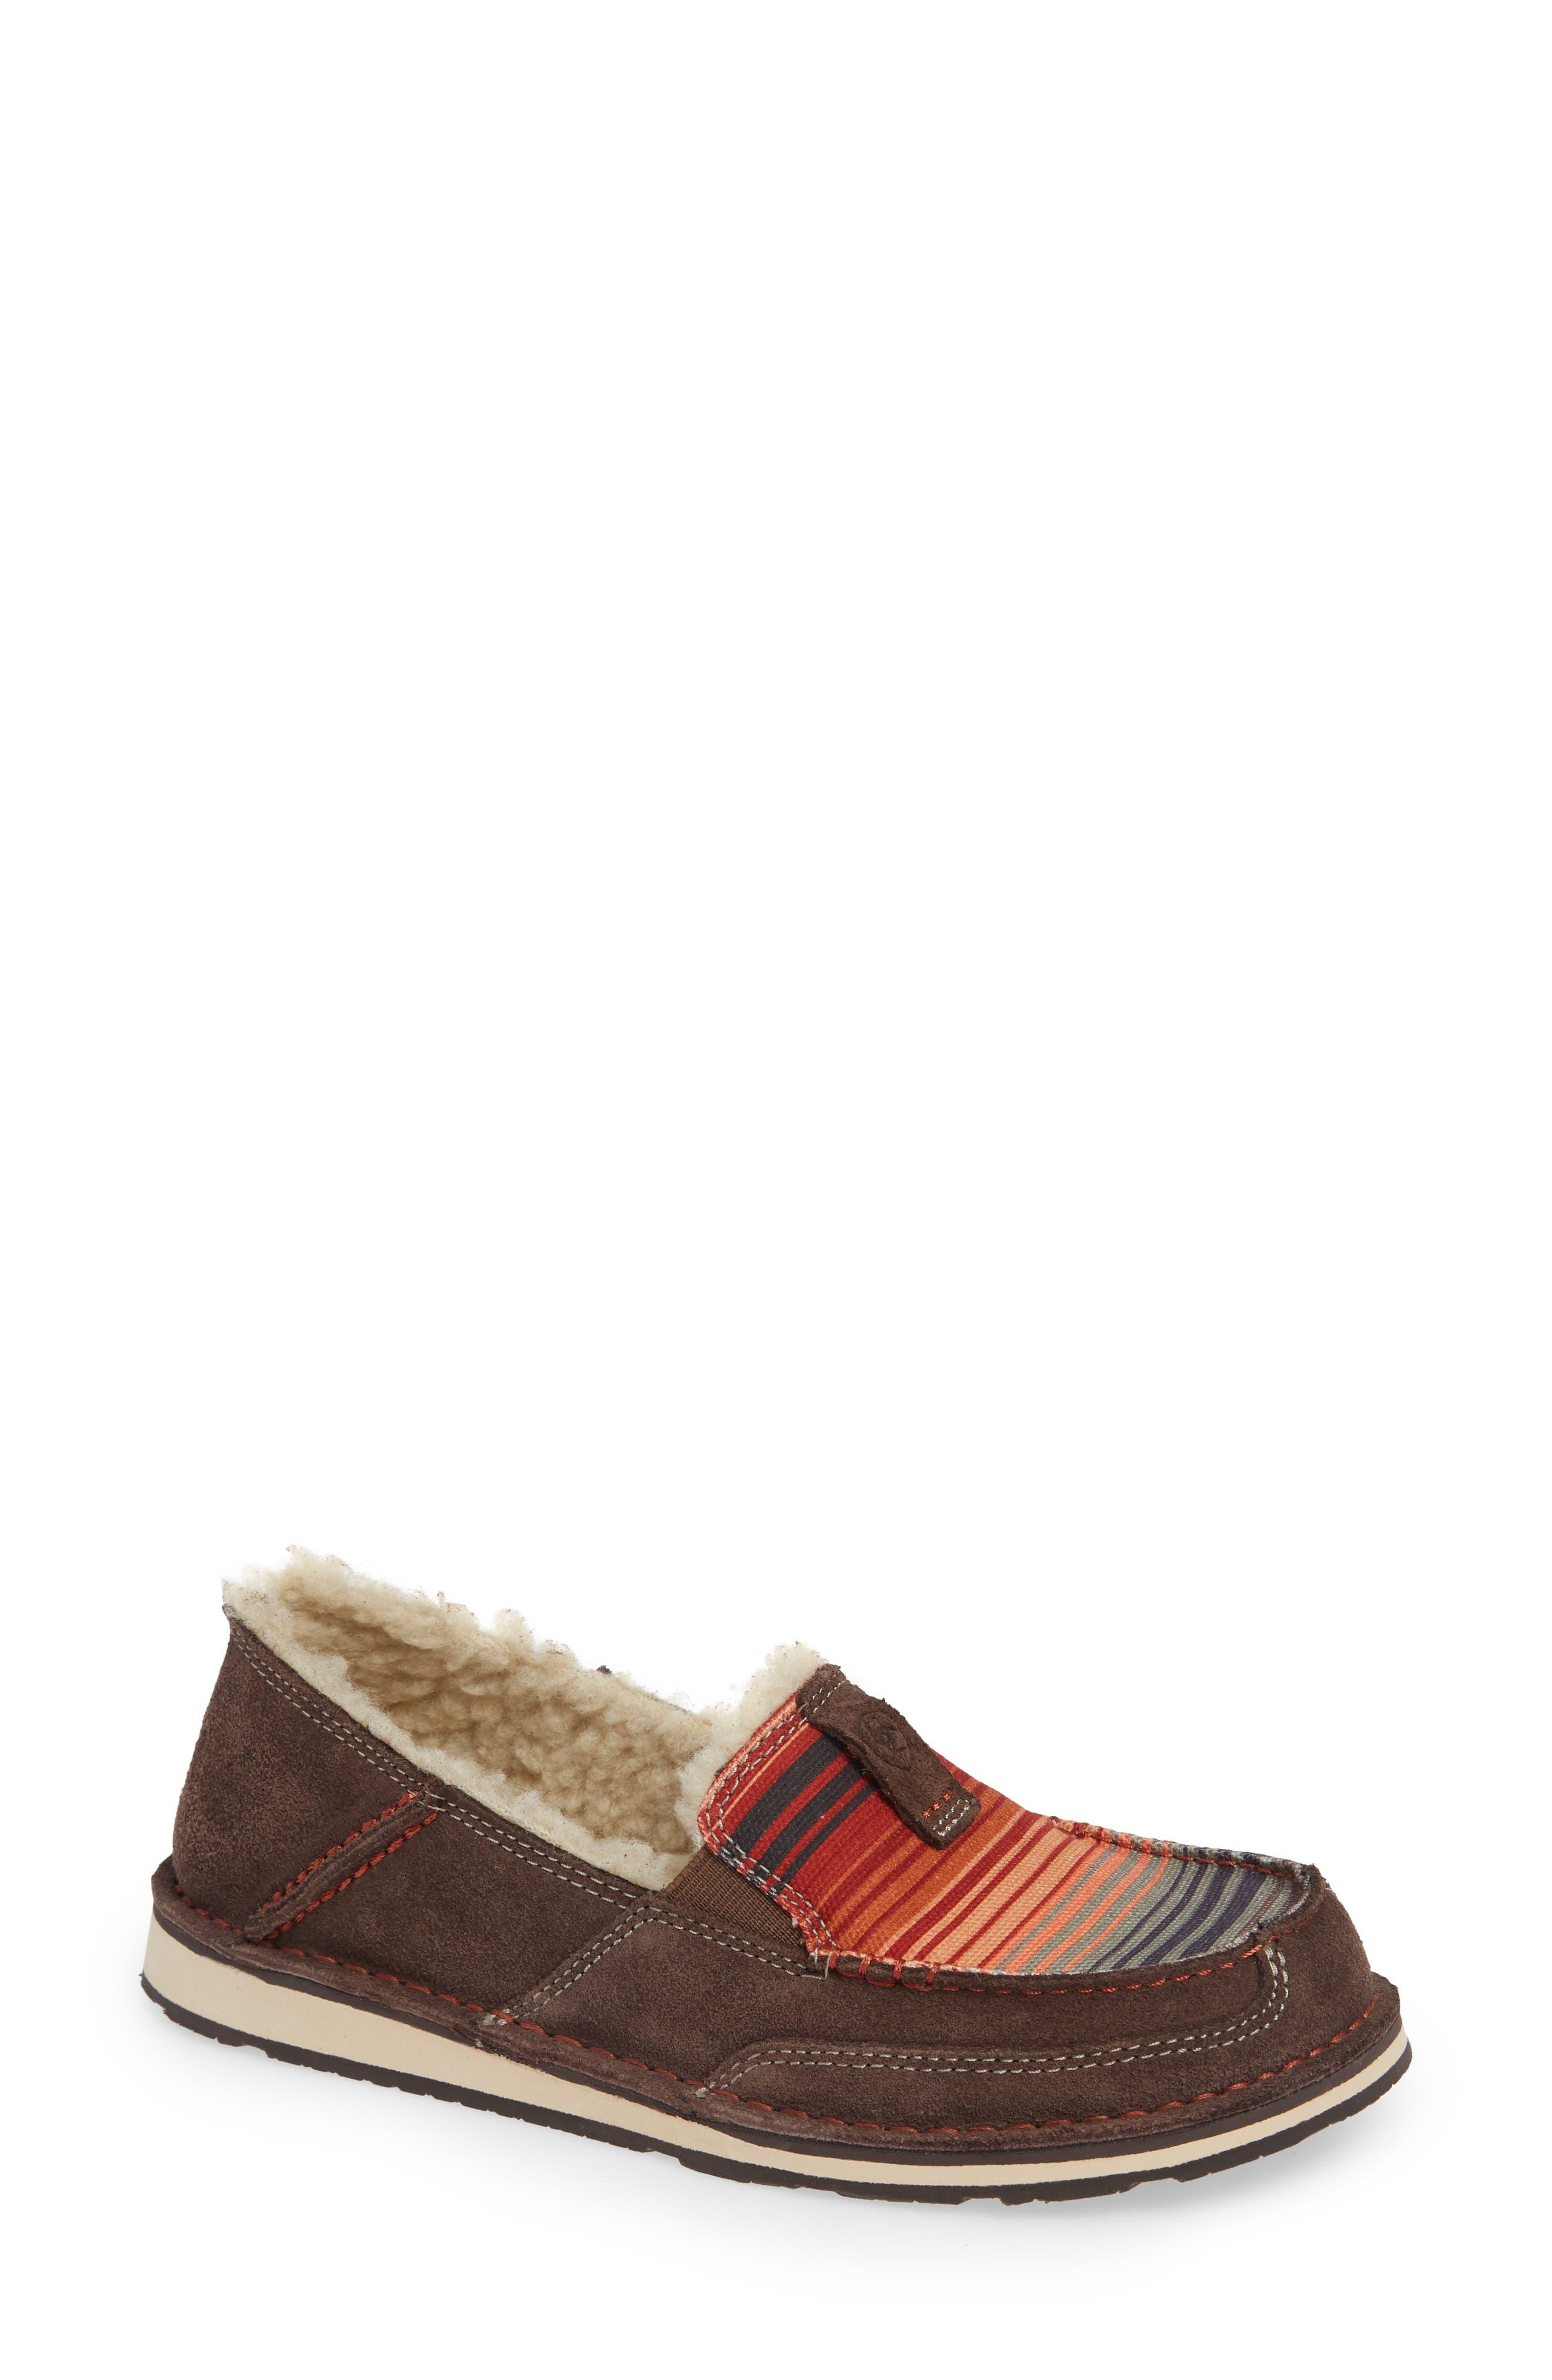 Ariat Cruiser Slip-On Loafer- Brown